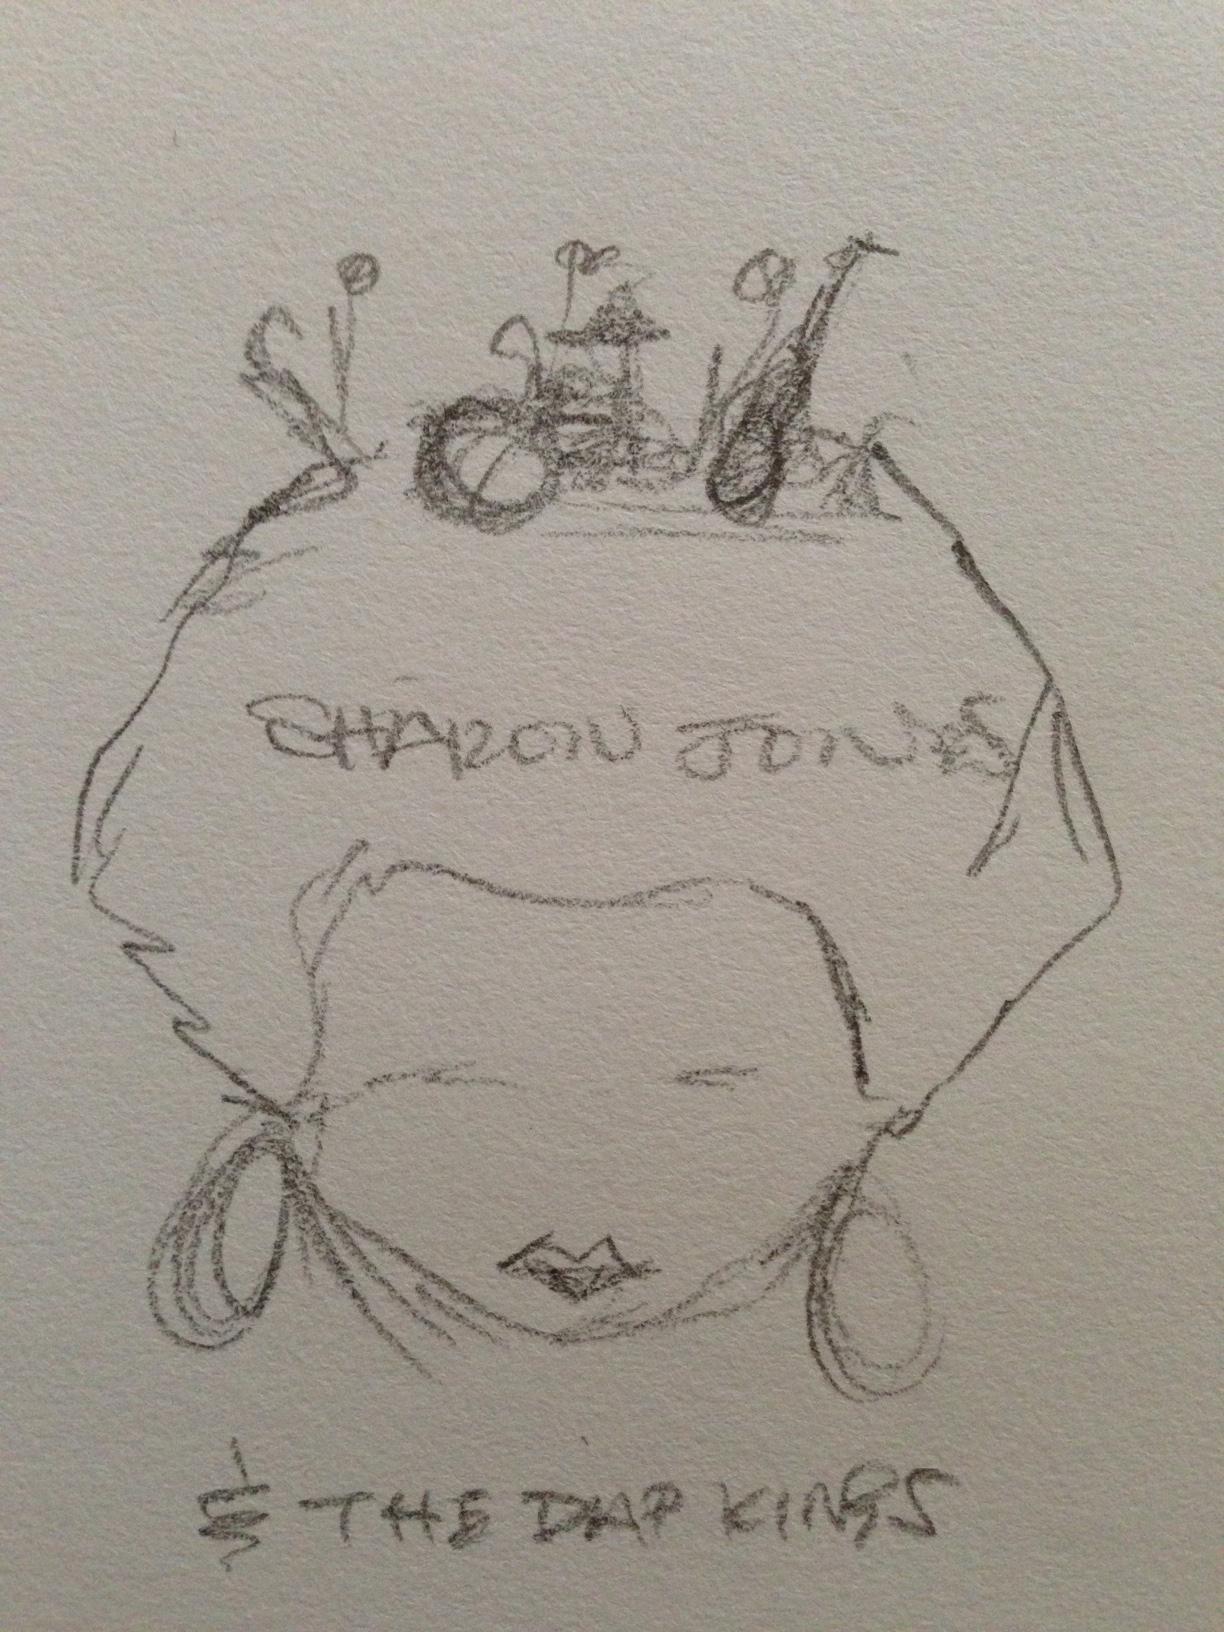 Sharon Jones and the Dap Kings - image 3 - student project